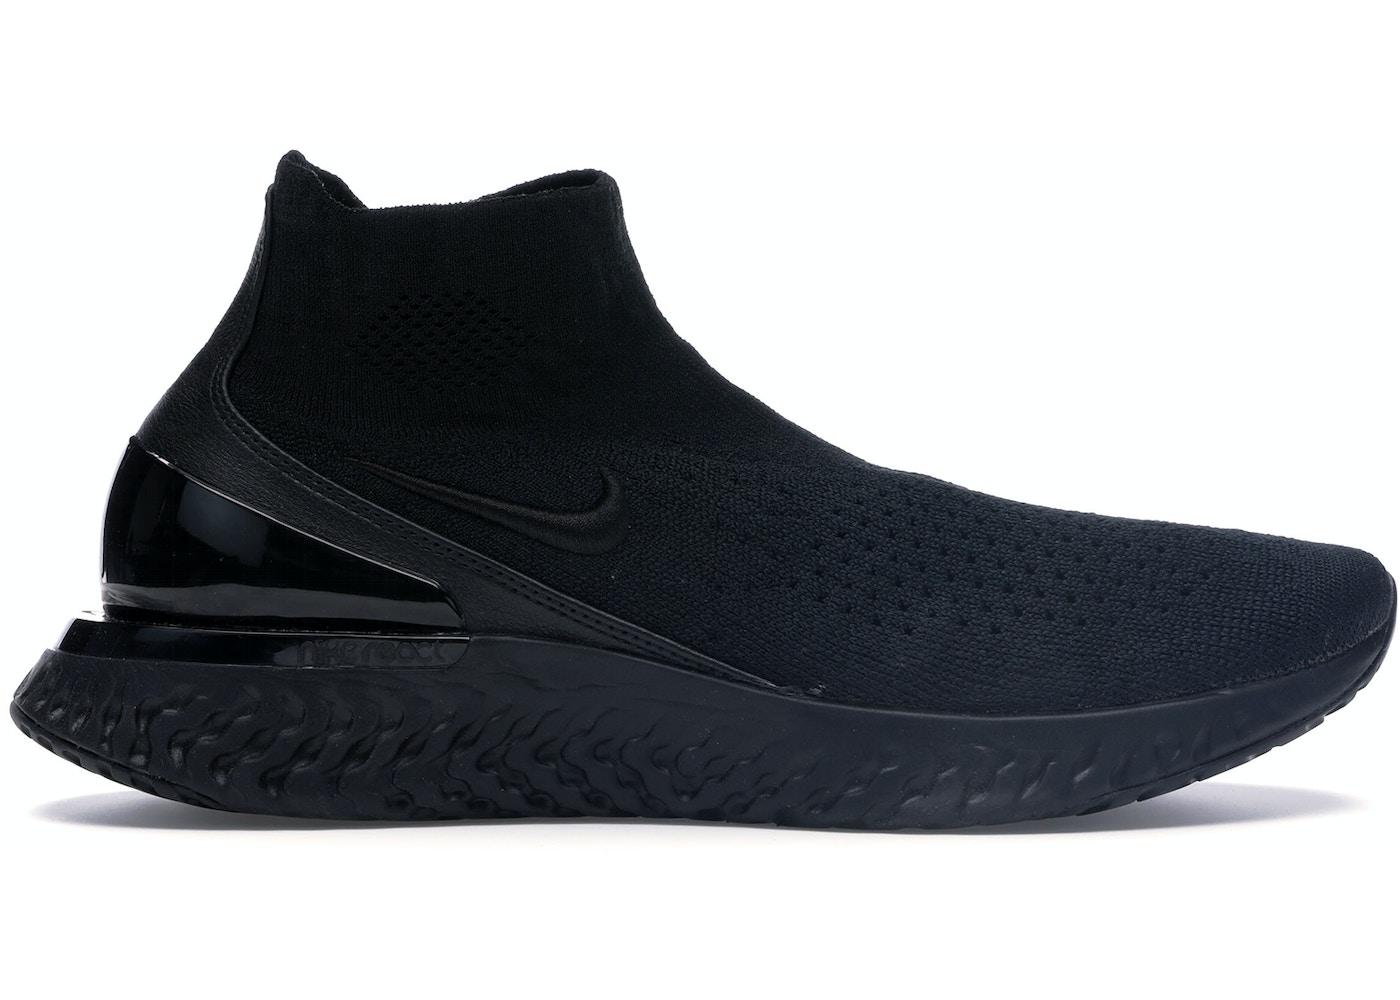 5fa7c5d2 Nike Rise React Flyknit Triple Black - AV5554-003